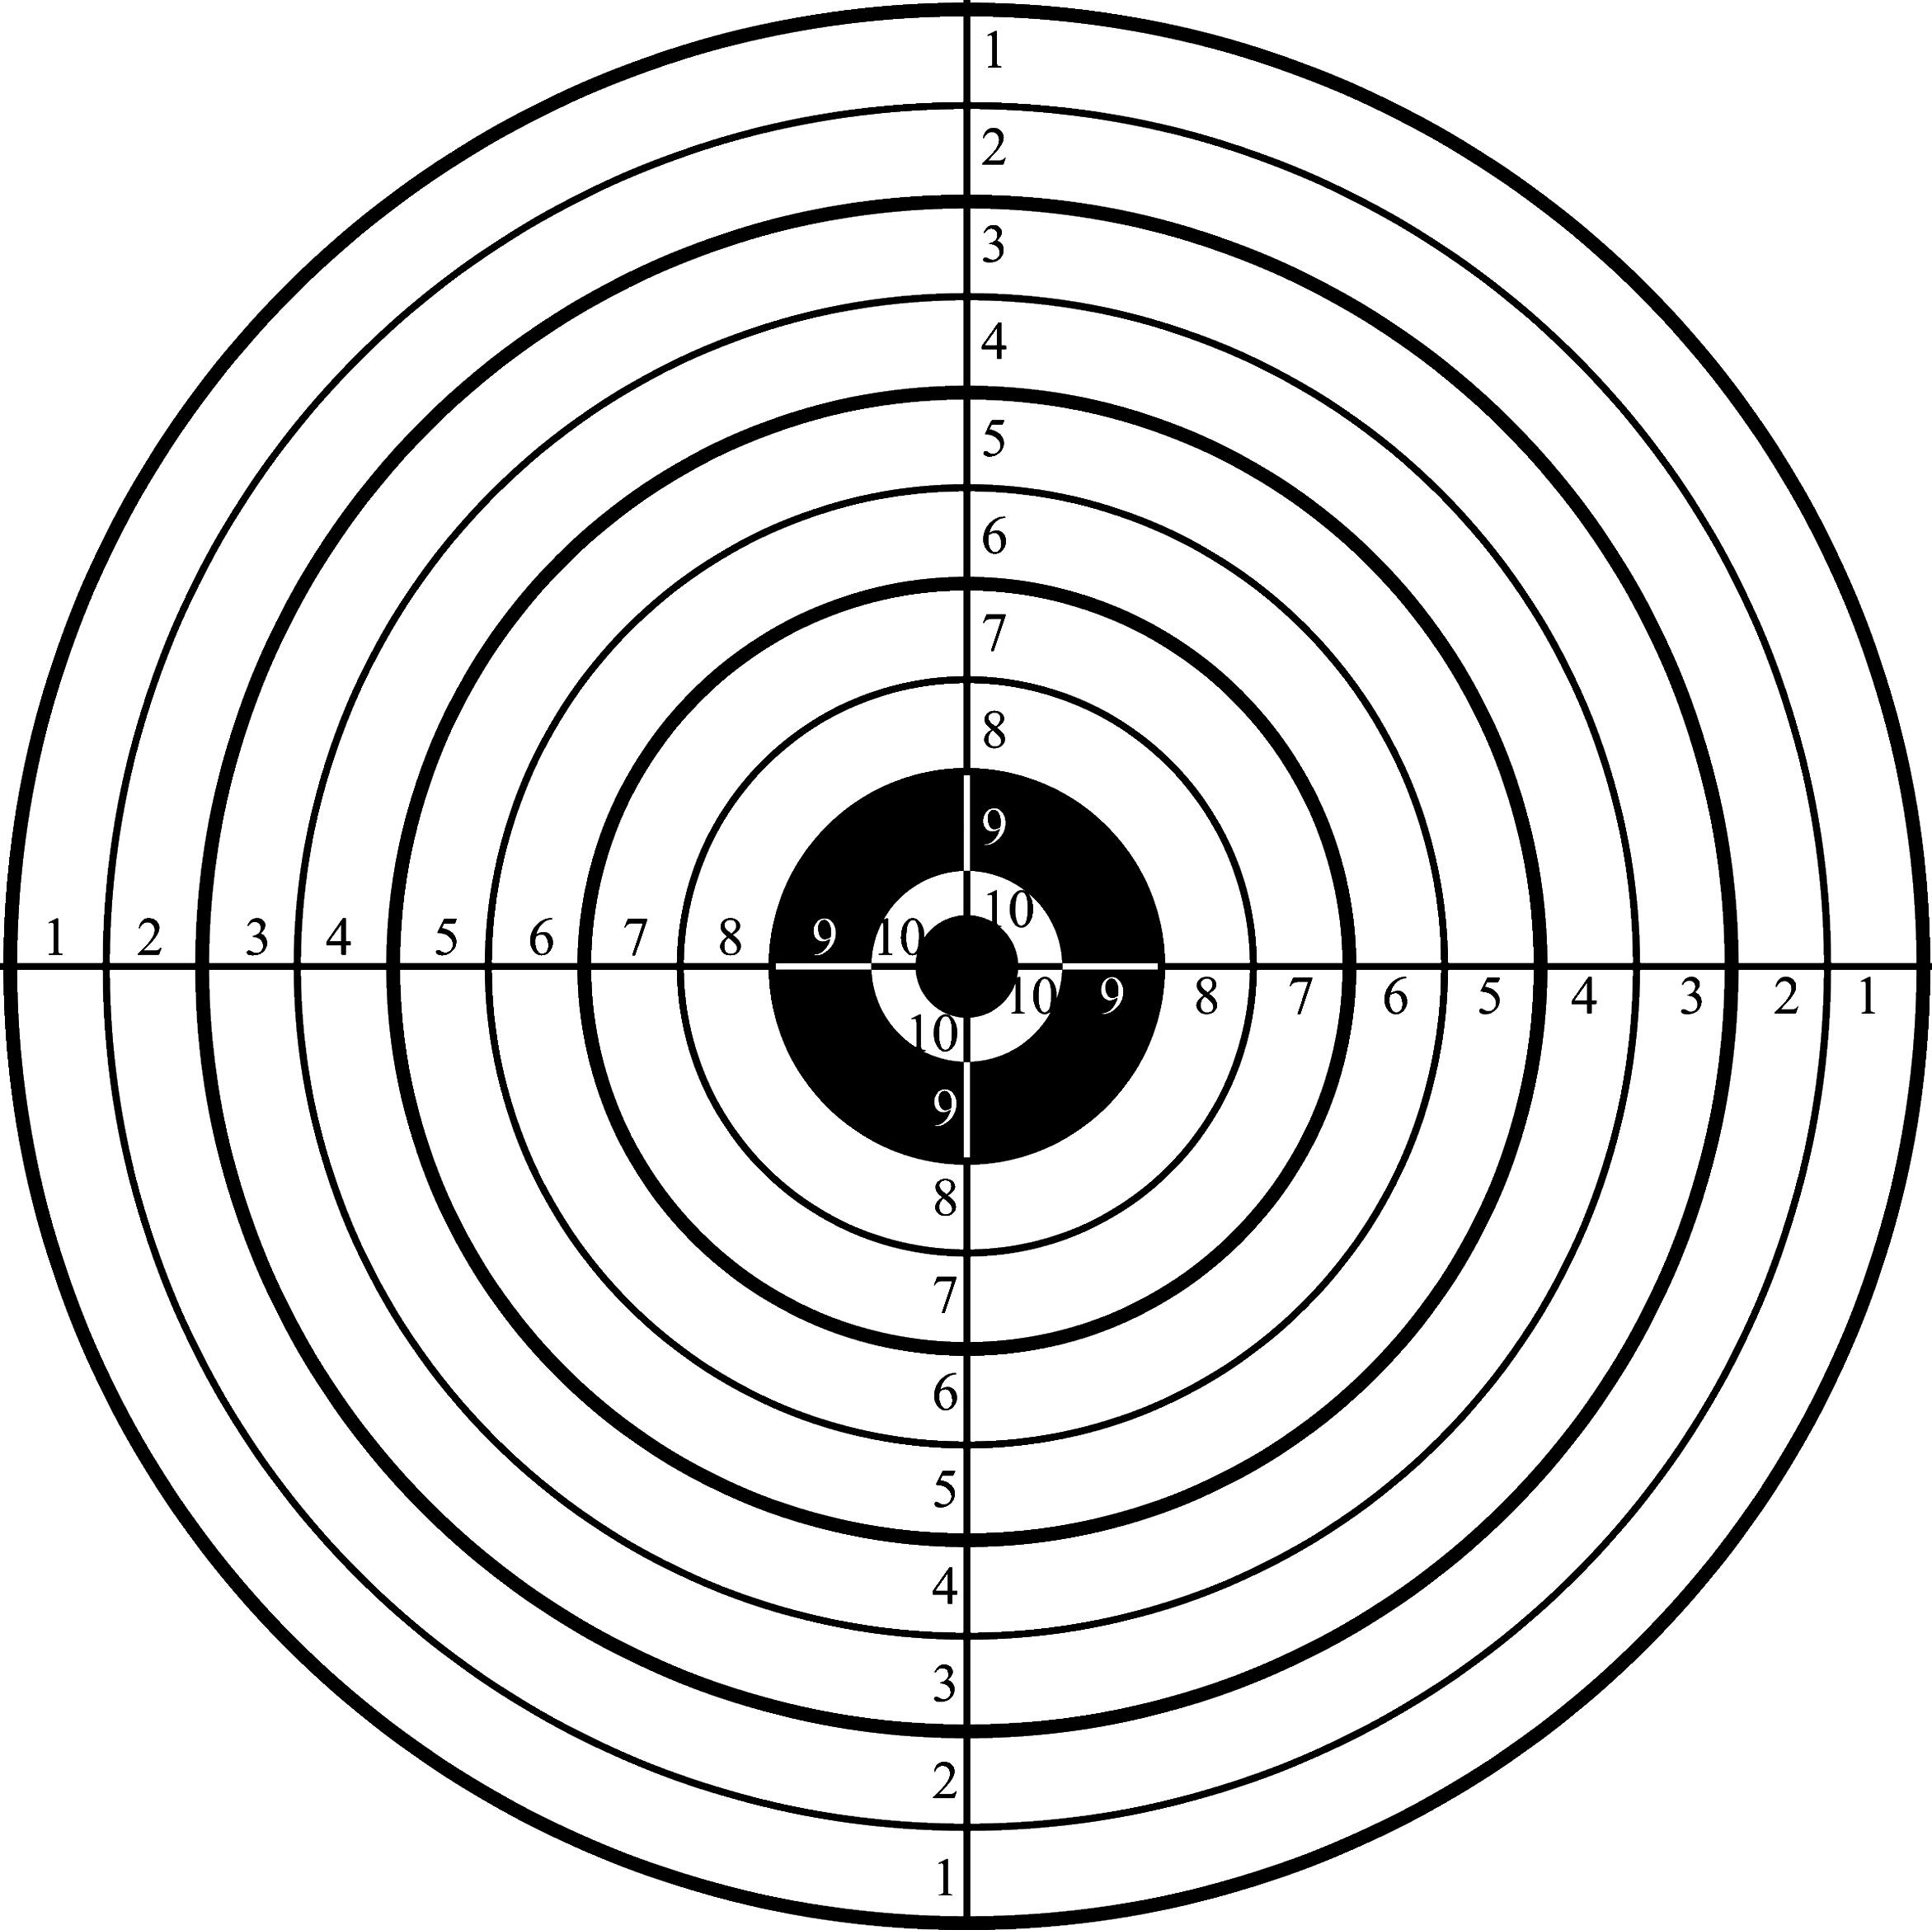 Printable Shooting Targets for Pistol, Rifle, Airgun, Archery